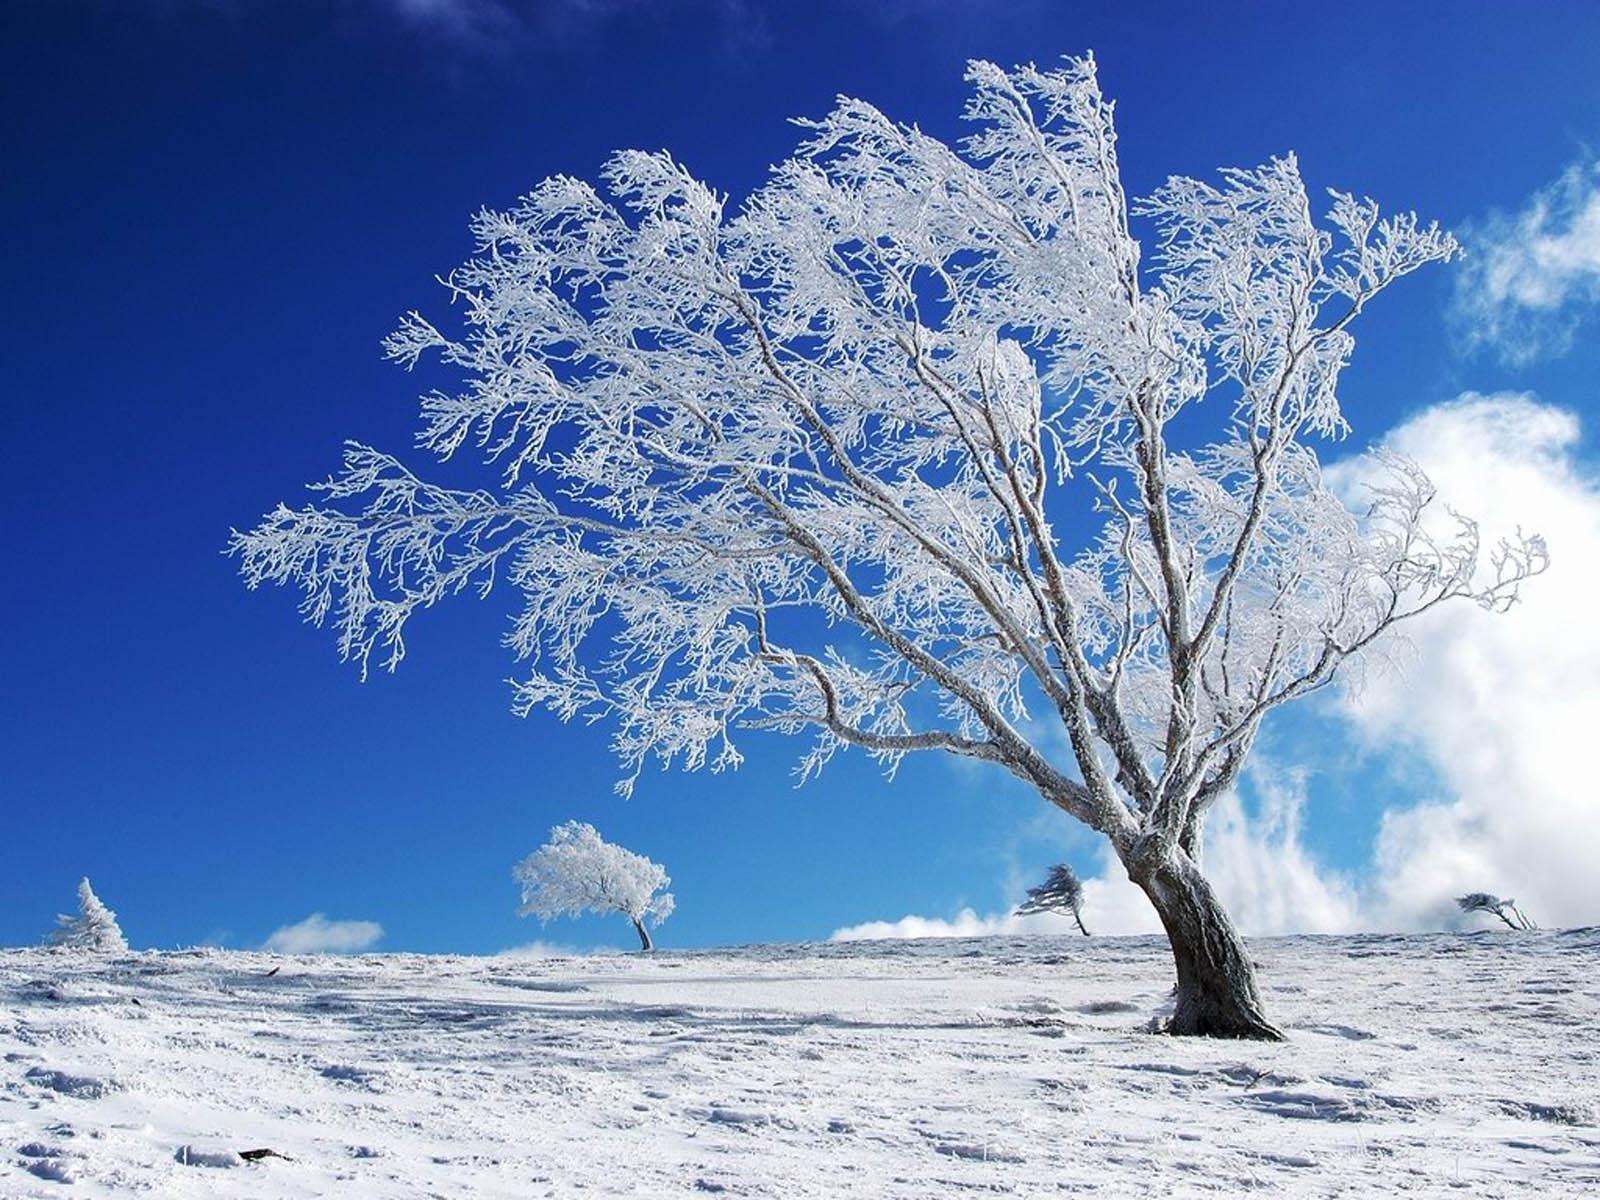 Winter Backgrounds for Desktop 1600x1200